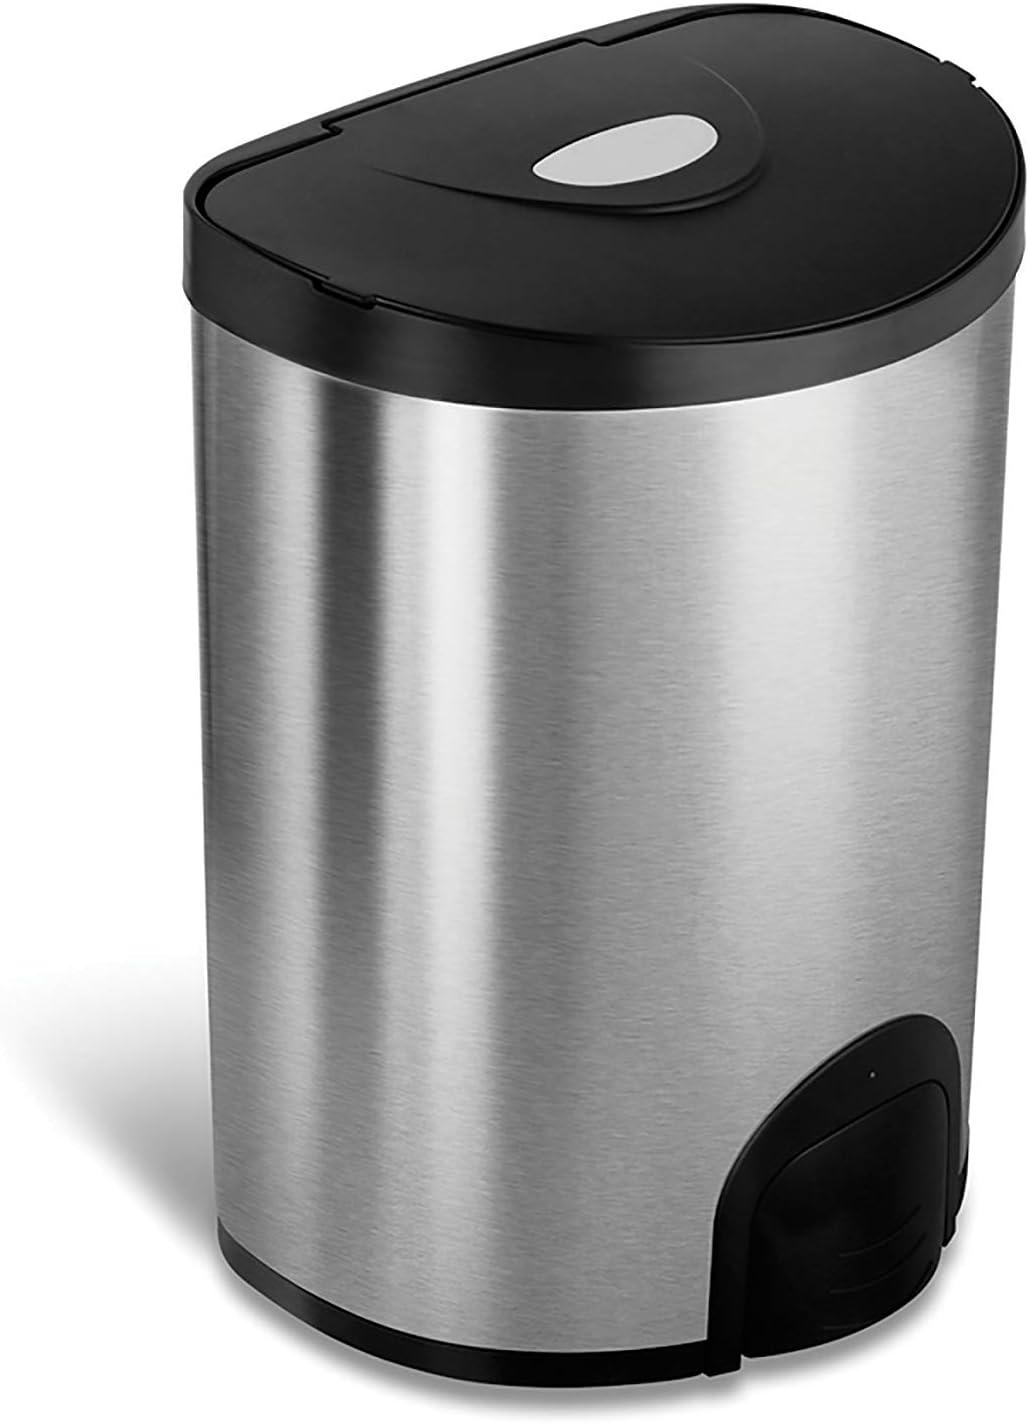 NINESTARS TTT-15-2 Automatic Tap Sensor Trash Can, 4 Gal 15L, Stainless Steel Base (D Shape, Black Lid)